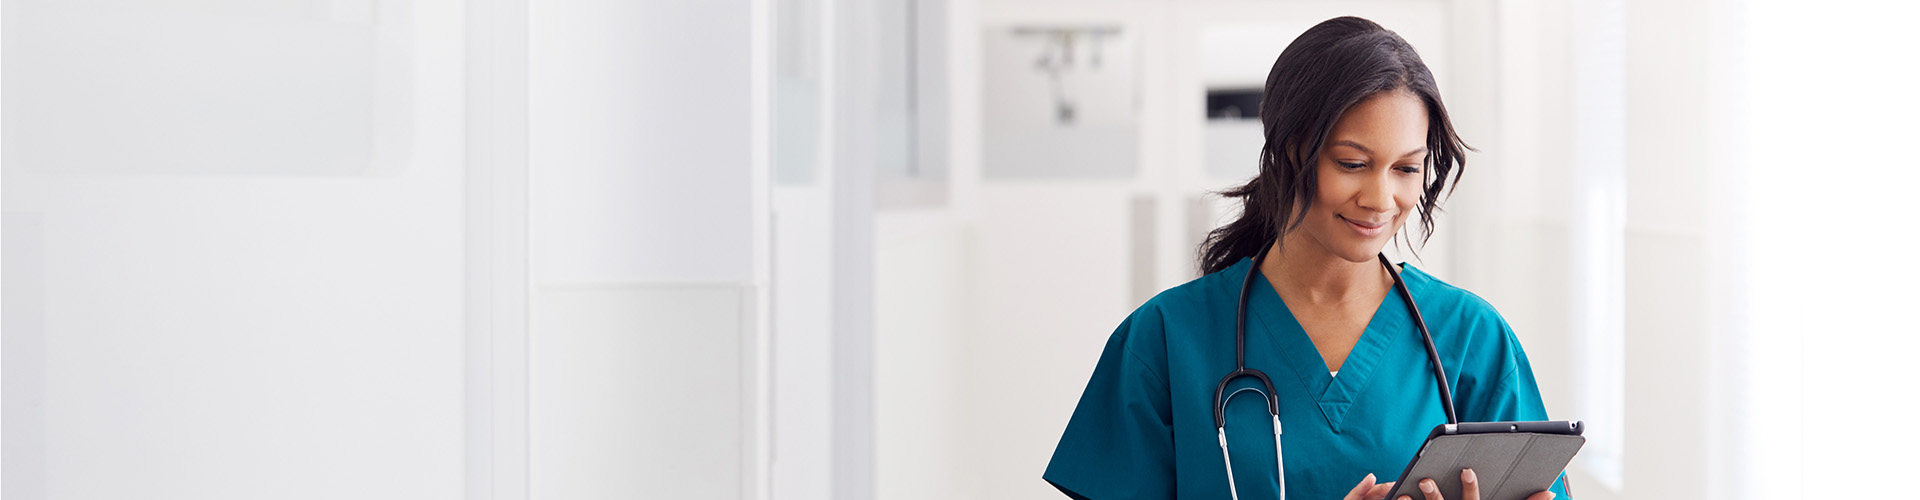 STIWELL Neurorehabilitation | for Professionals